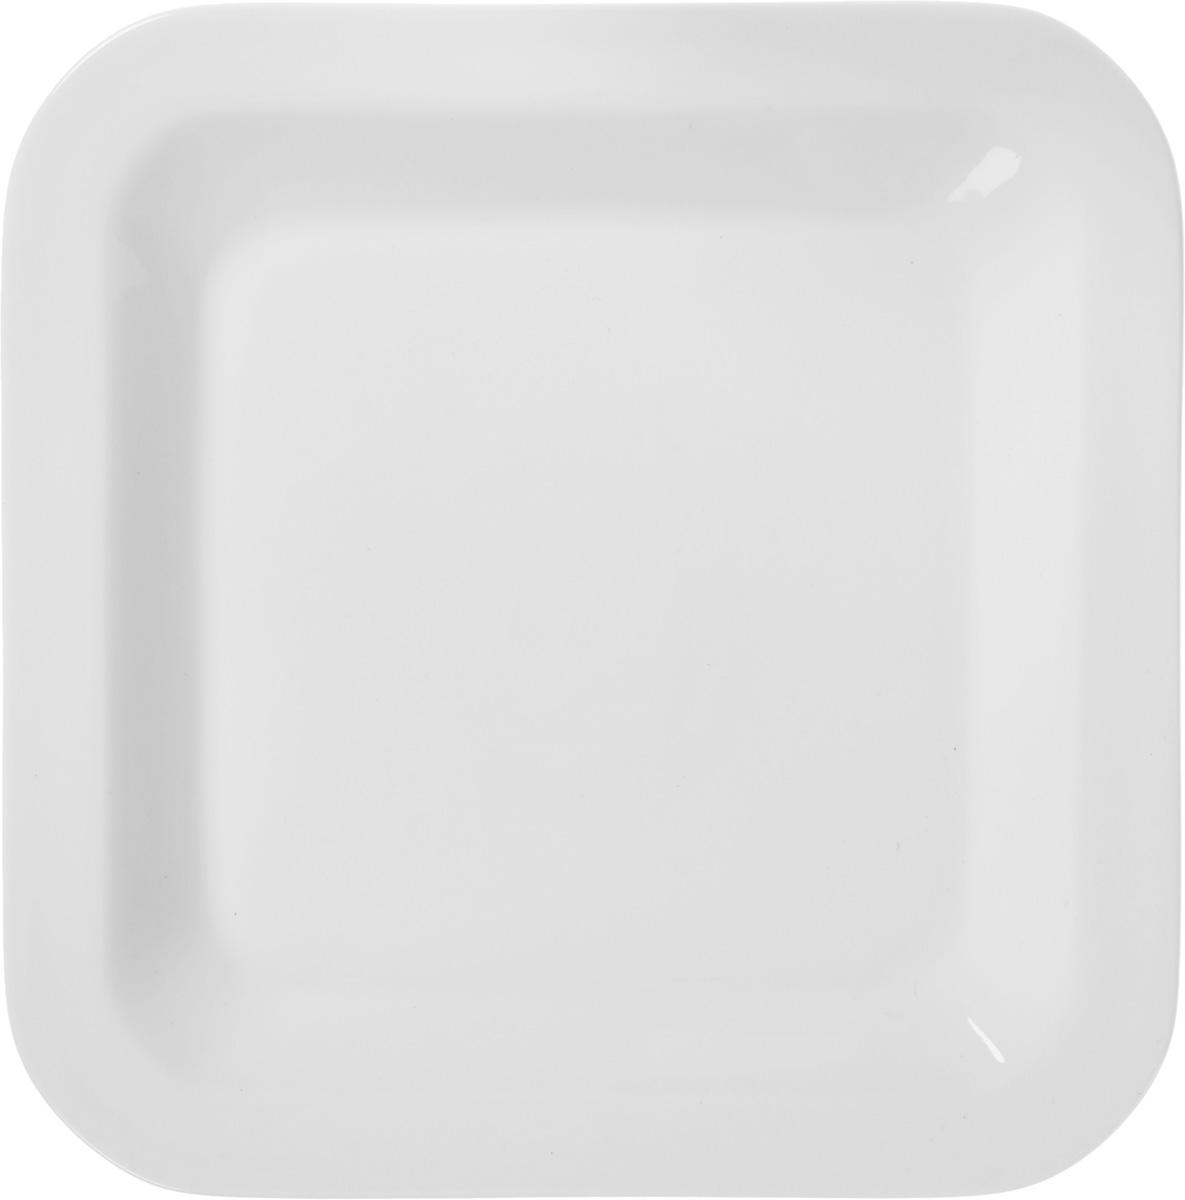 Тарелка десертная Tescoma Gustito, цвет: белый, 20 х 20см масленка tescoma gustito